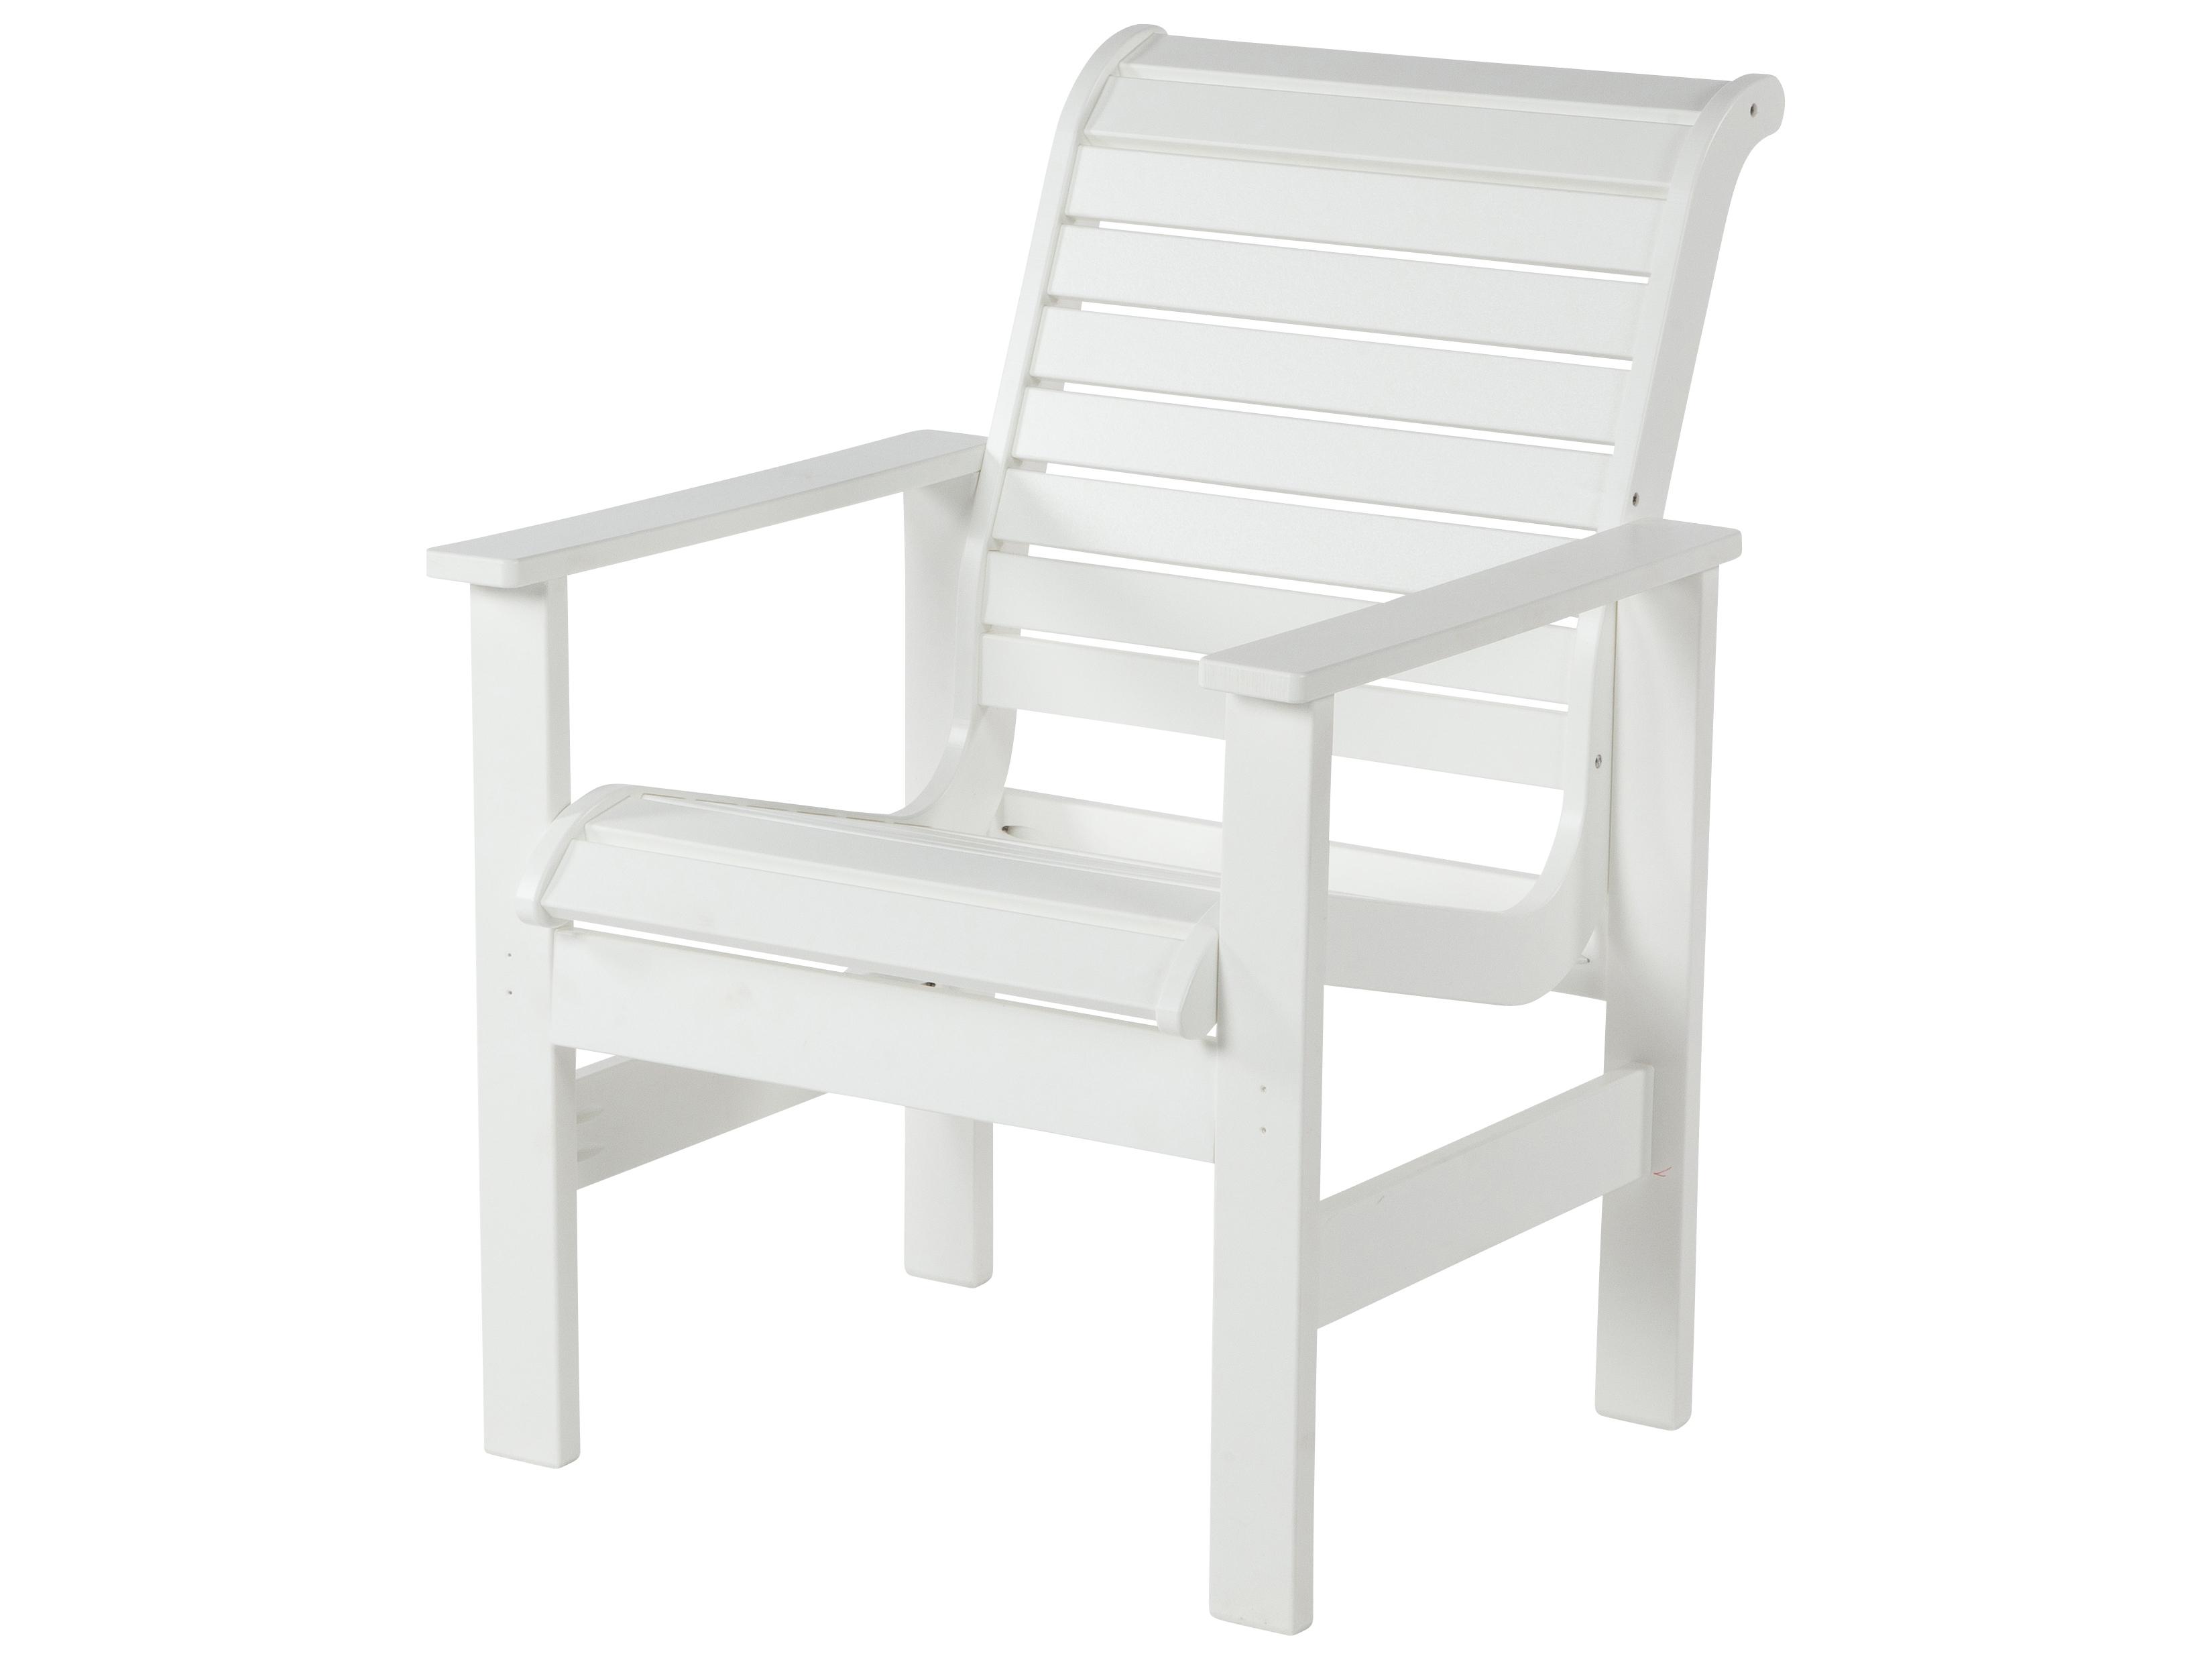 chair covers kingston bar stool chairs ikea windward design group solid marine grade polymer